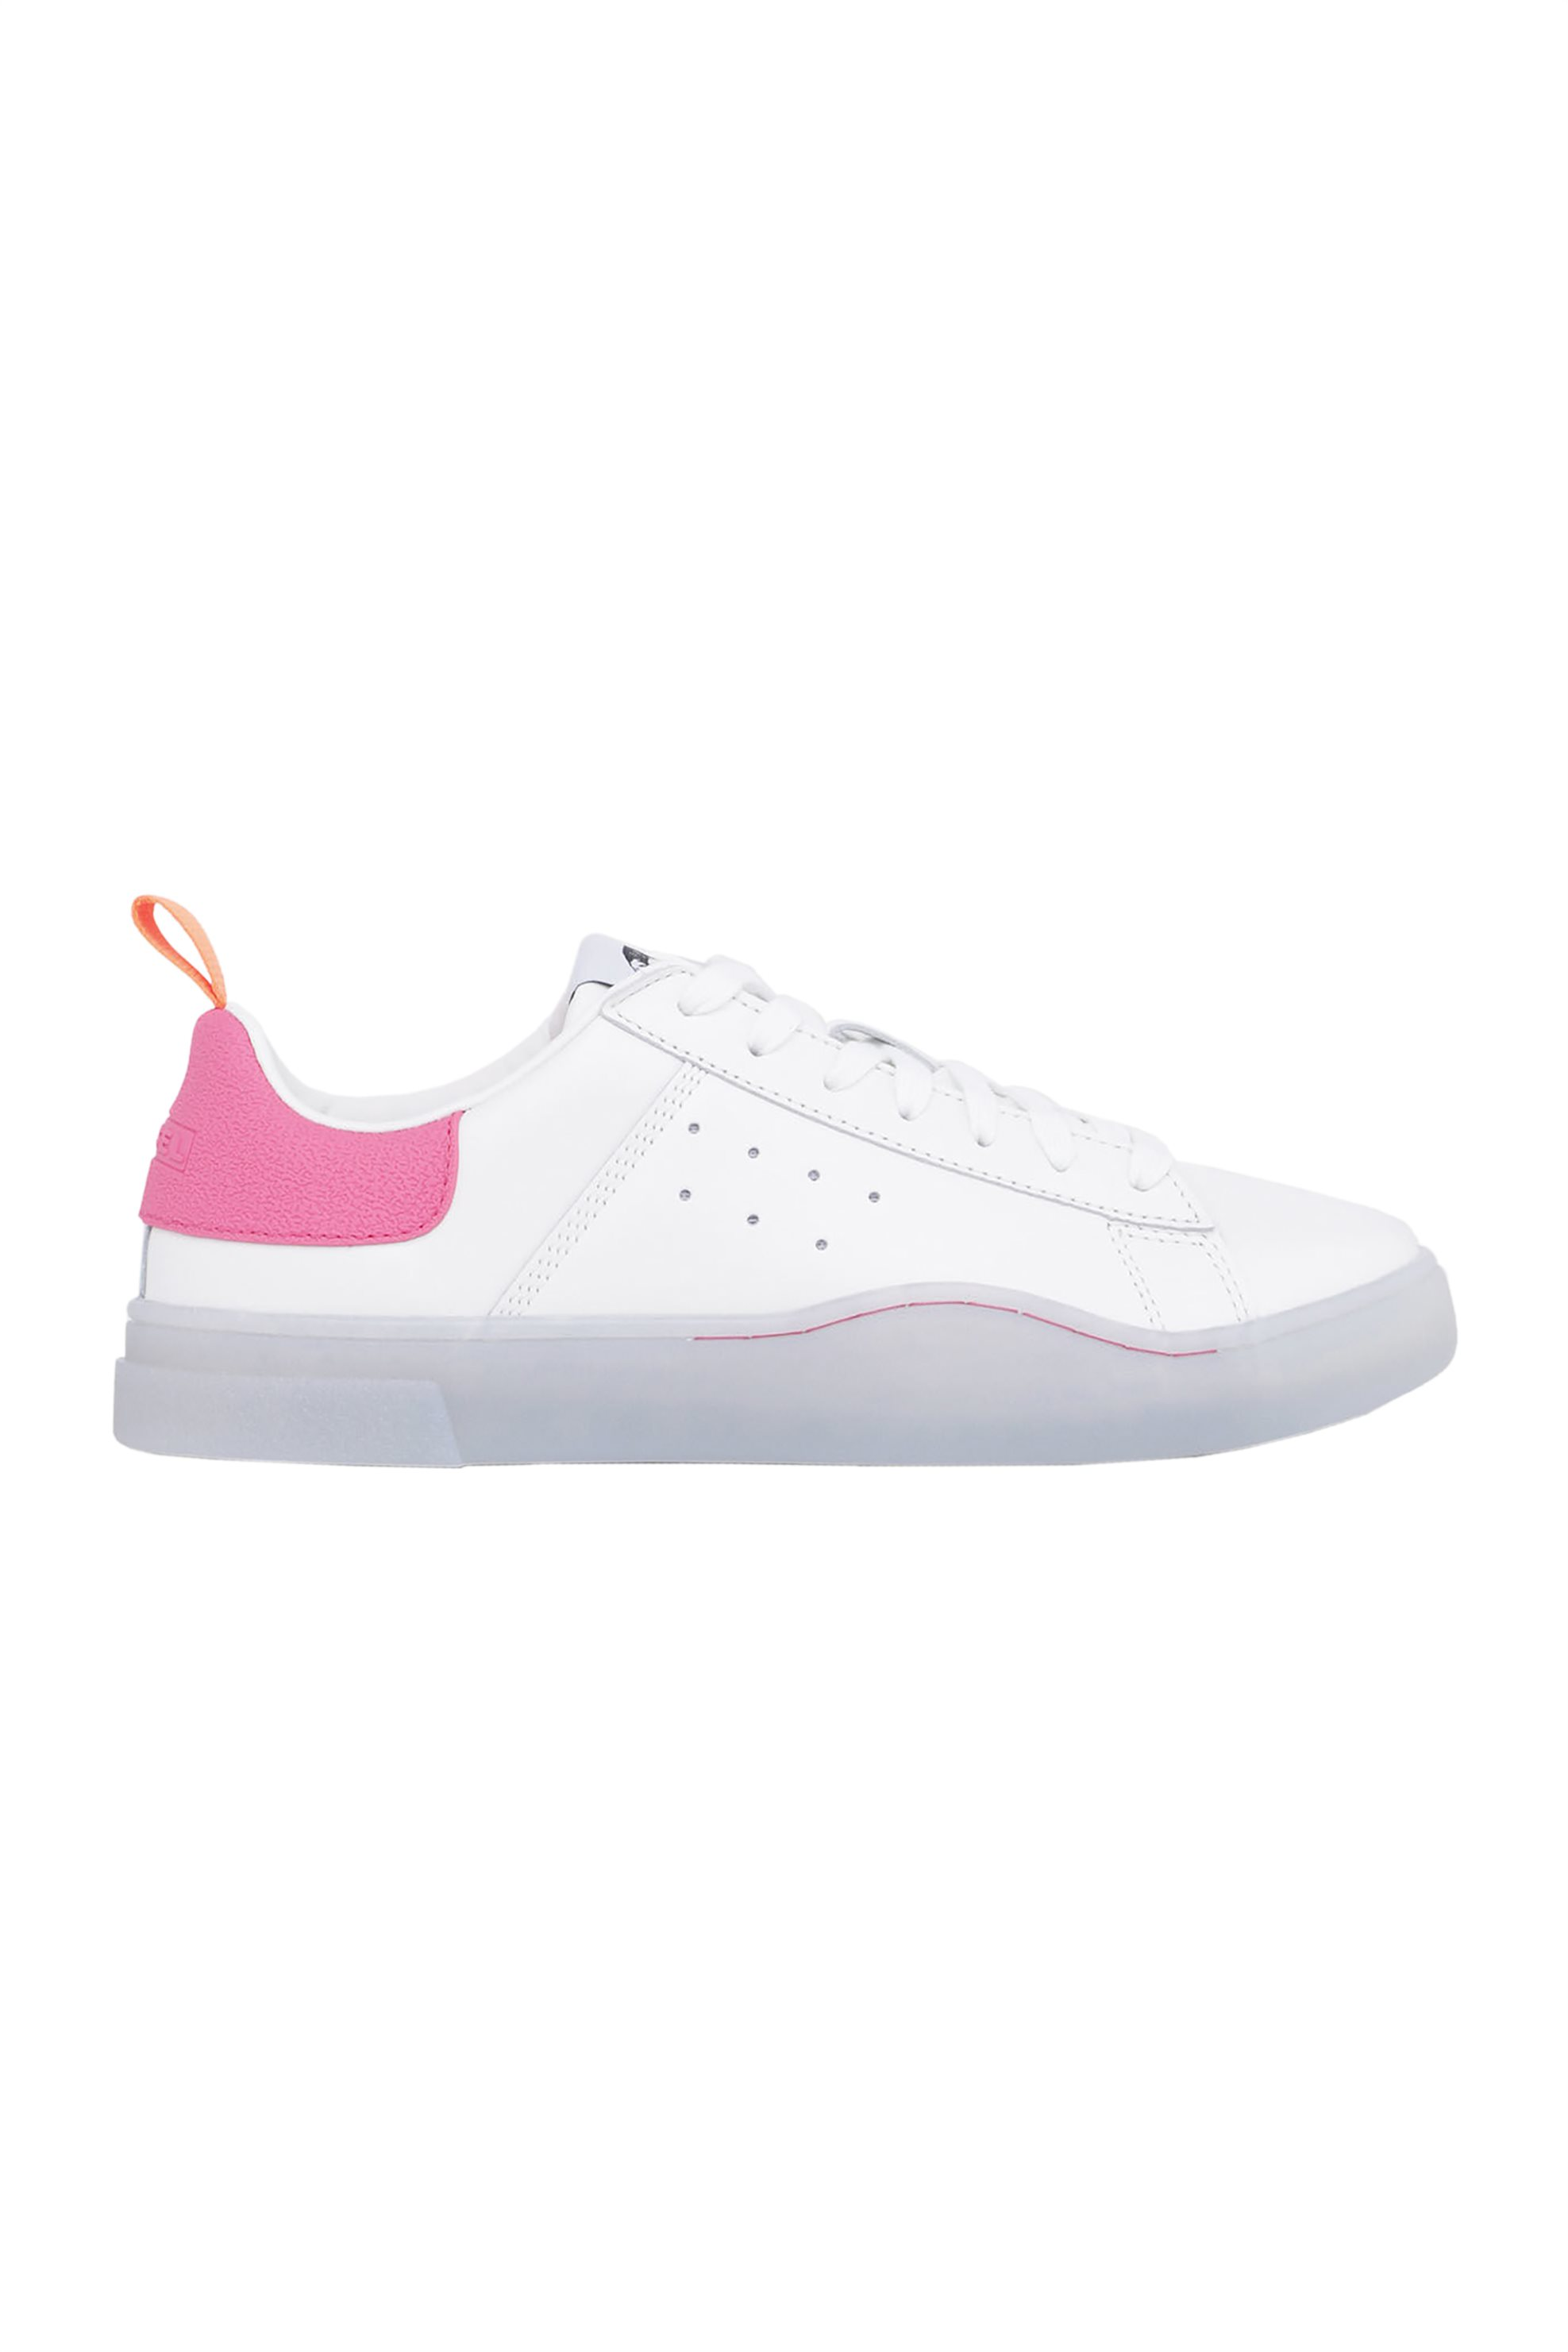 eb94dcfa104 Notos Diesel γυναικεία sneakers με κορδόνια S Clever Low – Y01752 P2282 –  Λευκό